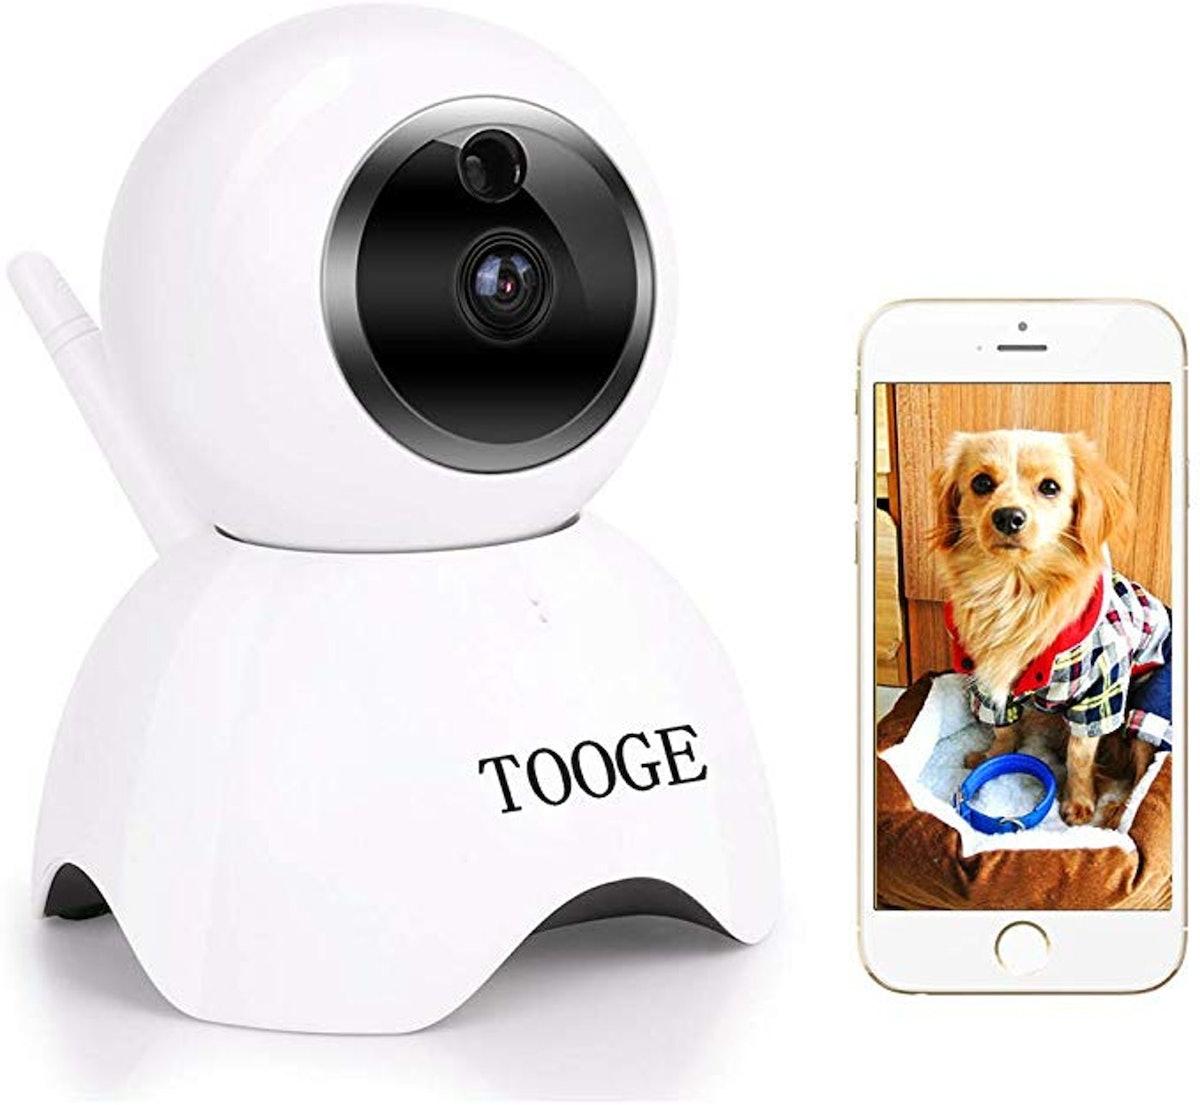 TOOGE Pet Camera